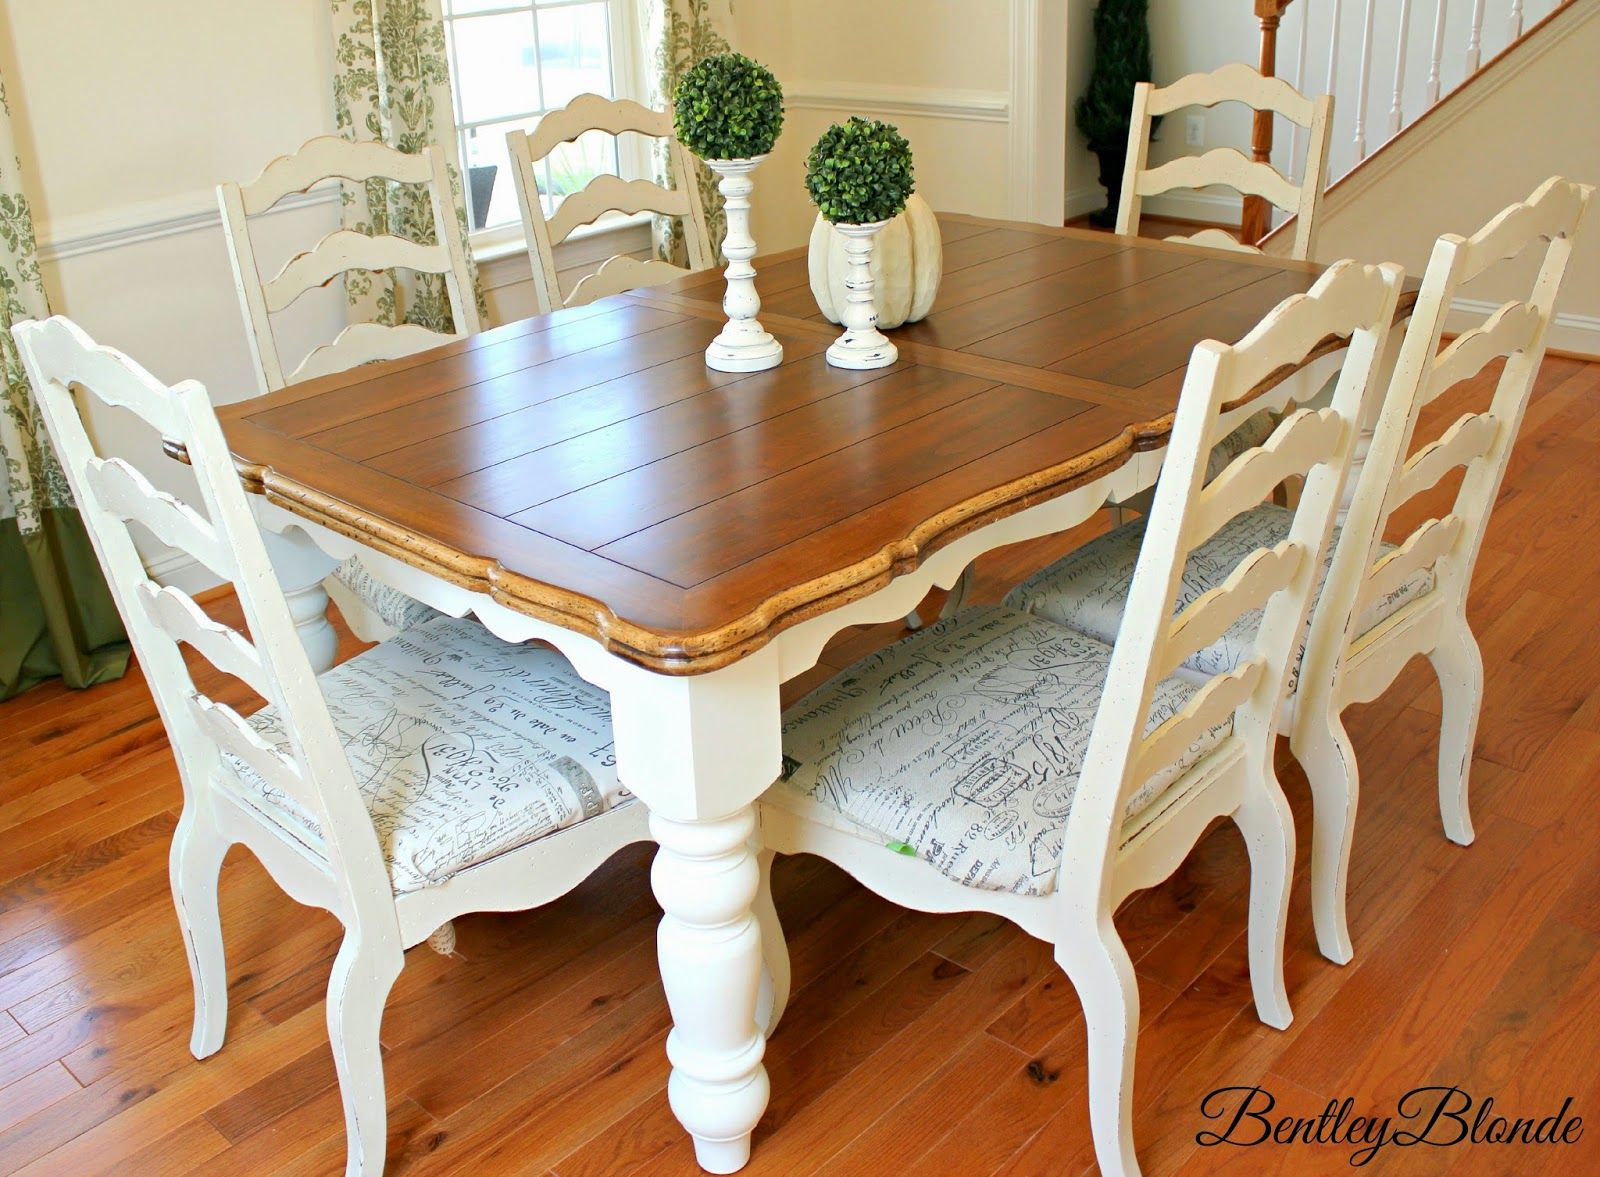 Bentleyblonde diy farmhouse table dining set makeover